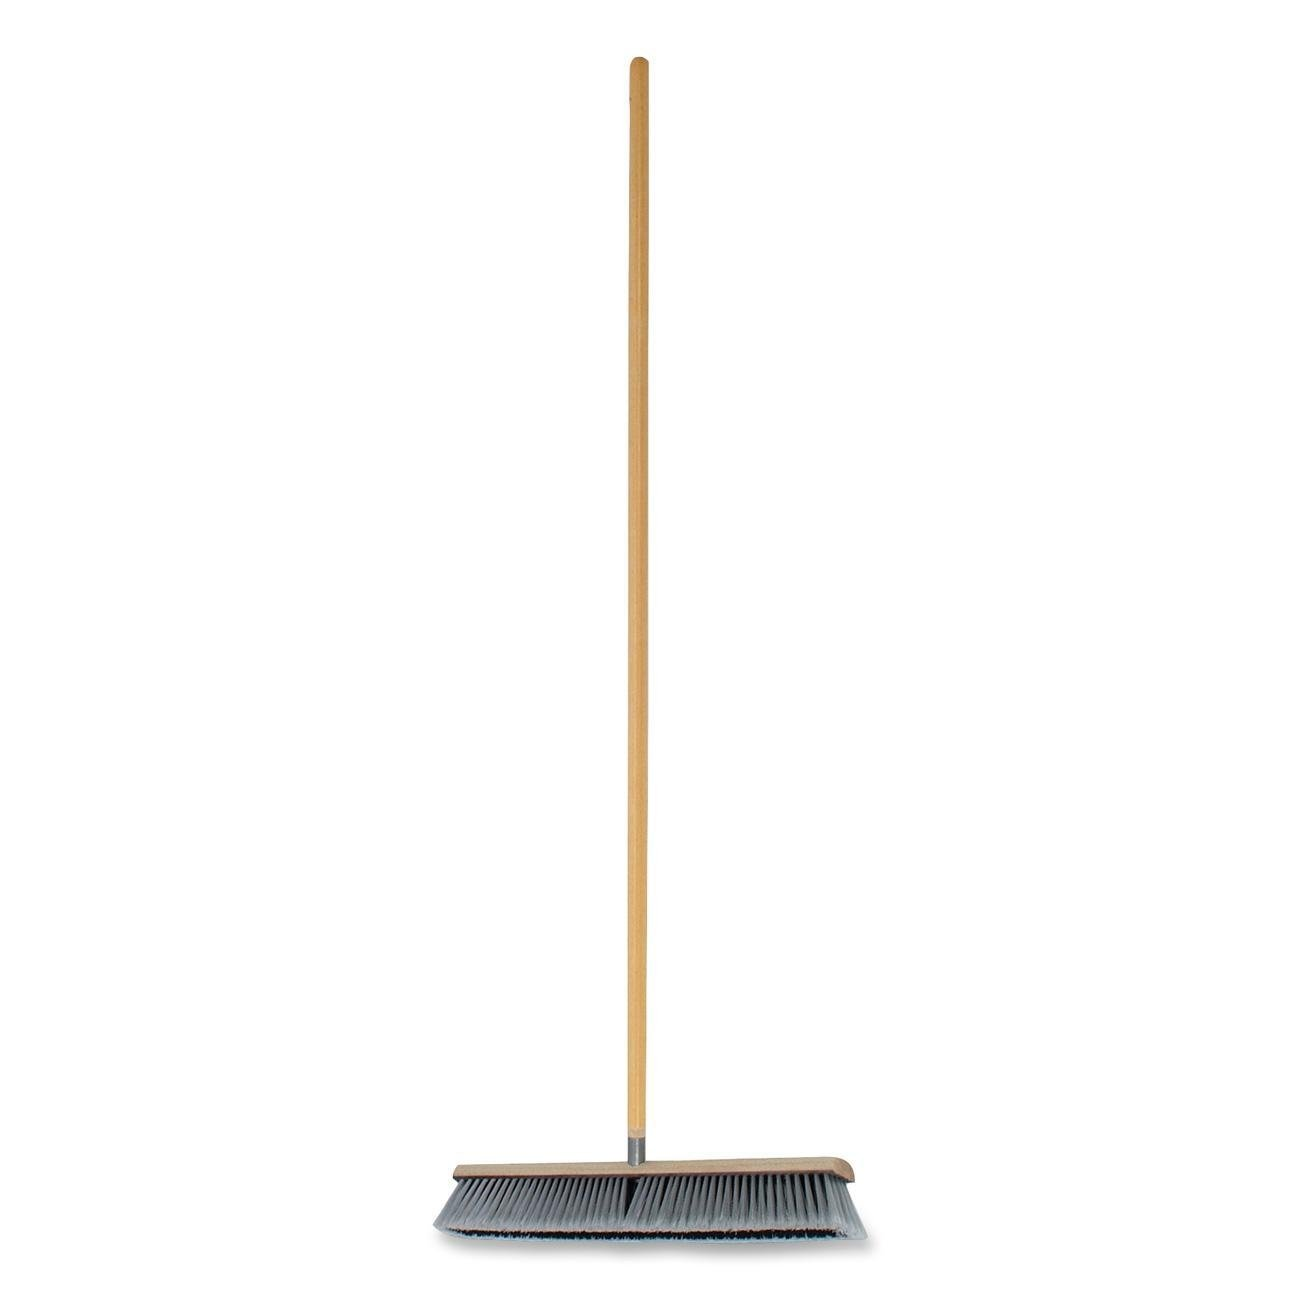 Genuine Joe GJO60467 Polypropylene Heavy Duty Manual Broom with Floor Sweep and Handle, 24'' Bristles